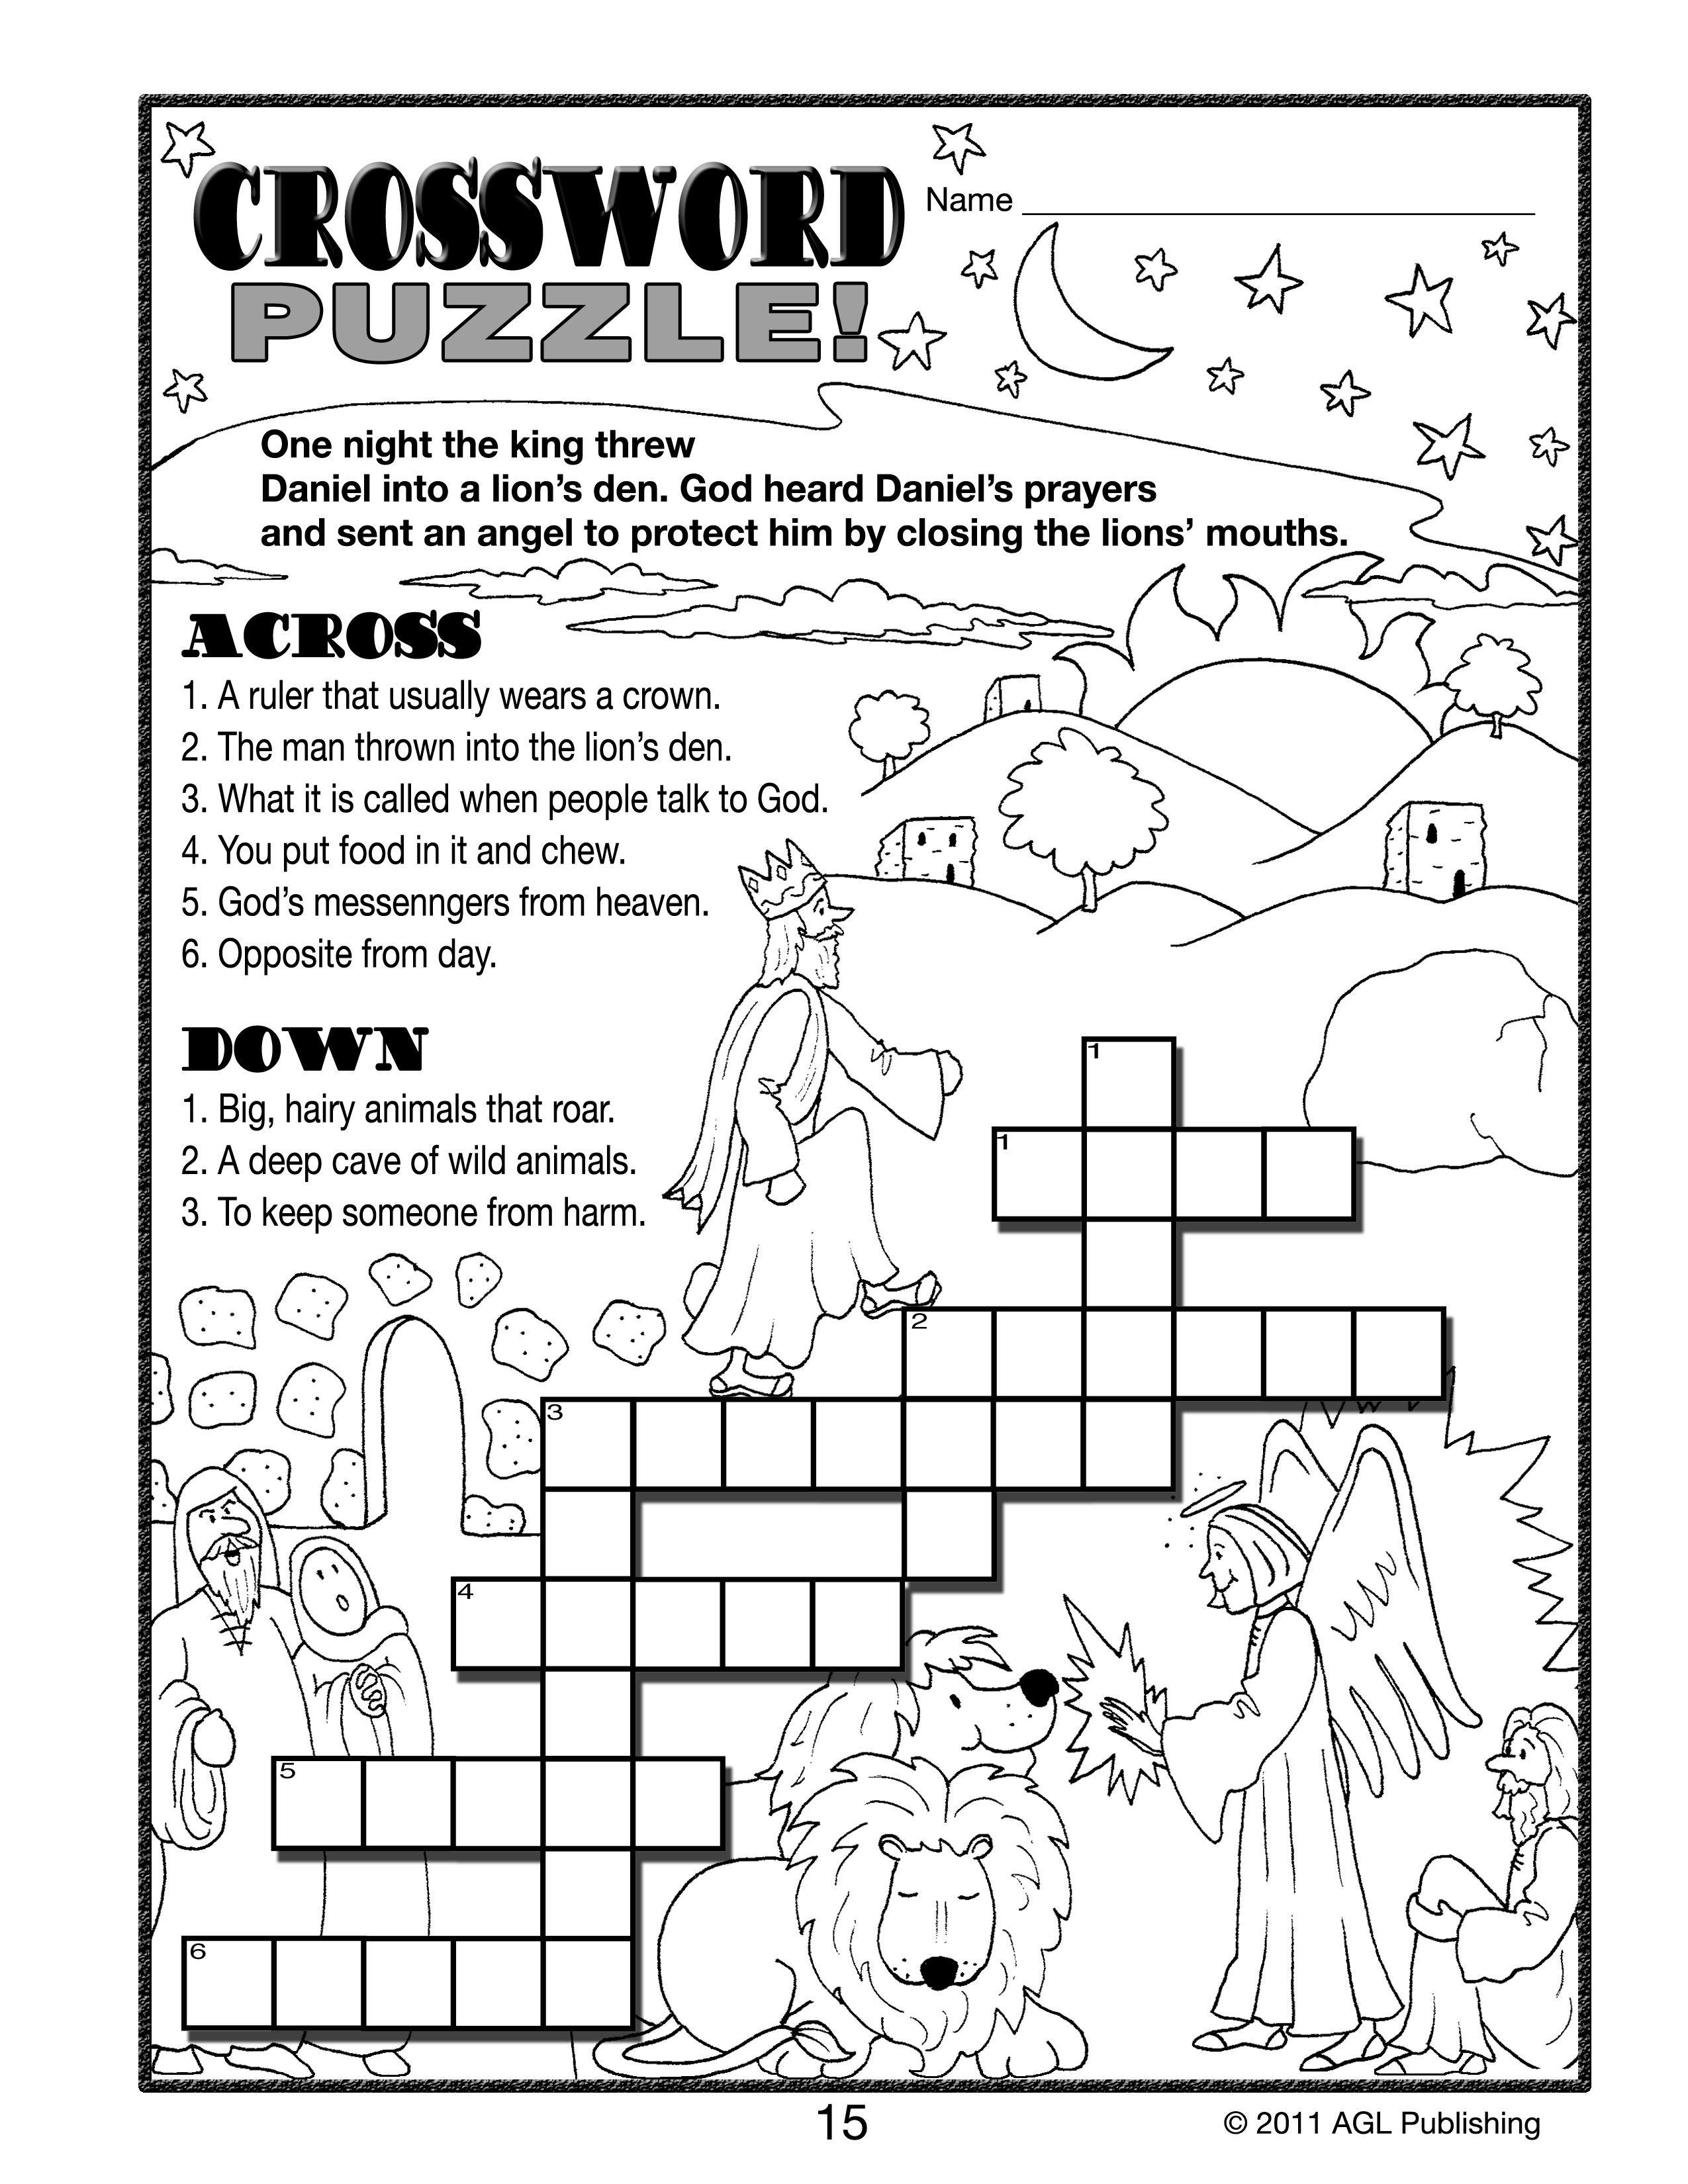 Valuable Bible Tools Activities Grades 3 4 Download Bible Printable English Worksheets Fun Worksheets For Kids Worksheets For Kids